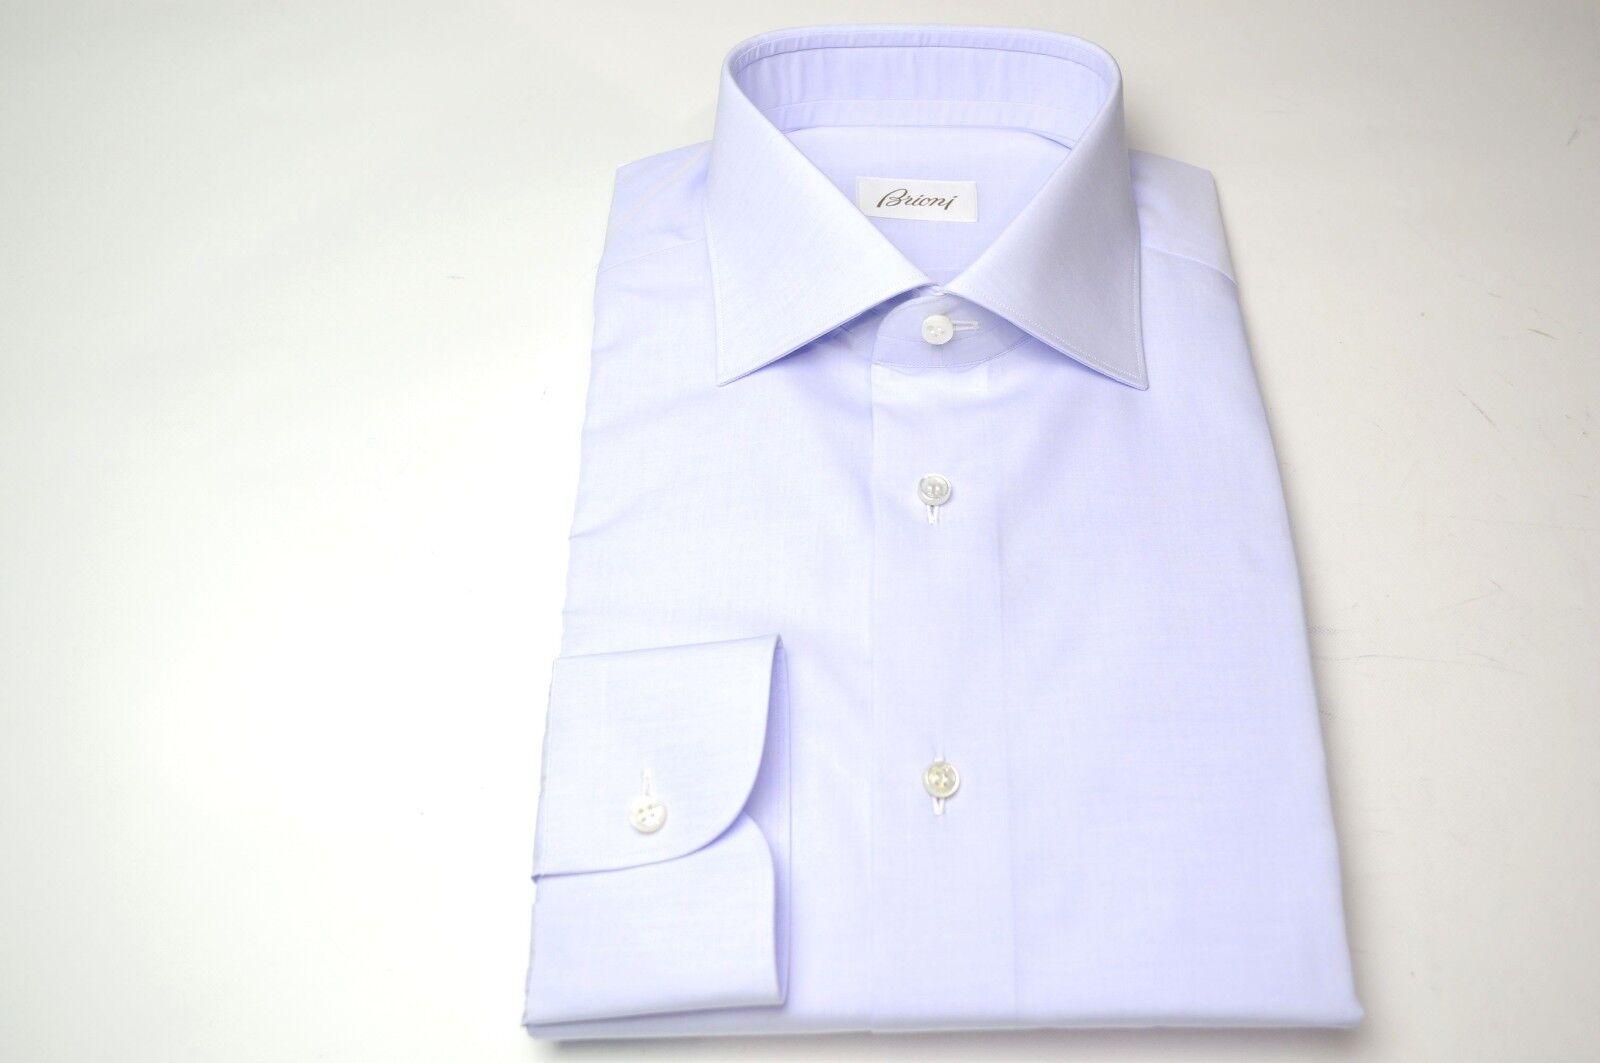 NEW  BRIONI Dress SHIRT 100% Cotton Größe 18.5 Us 47 Eu   (Store Code MA52)